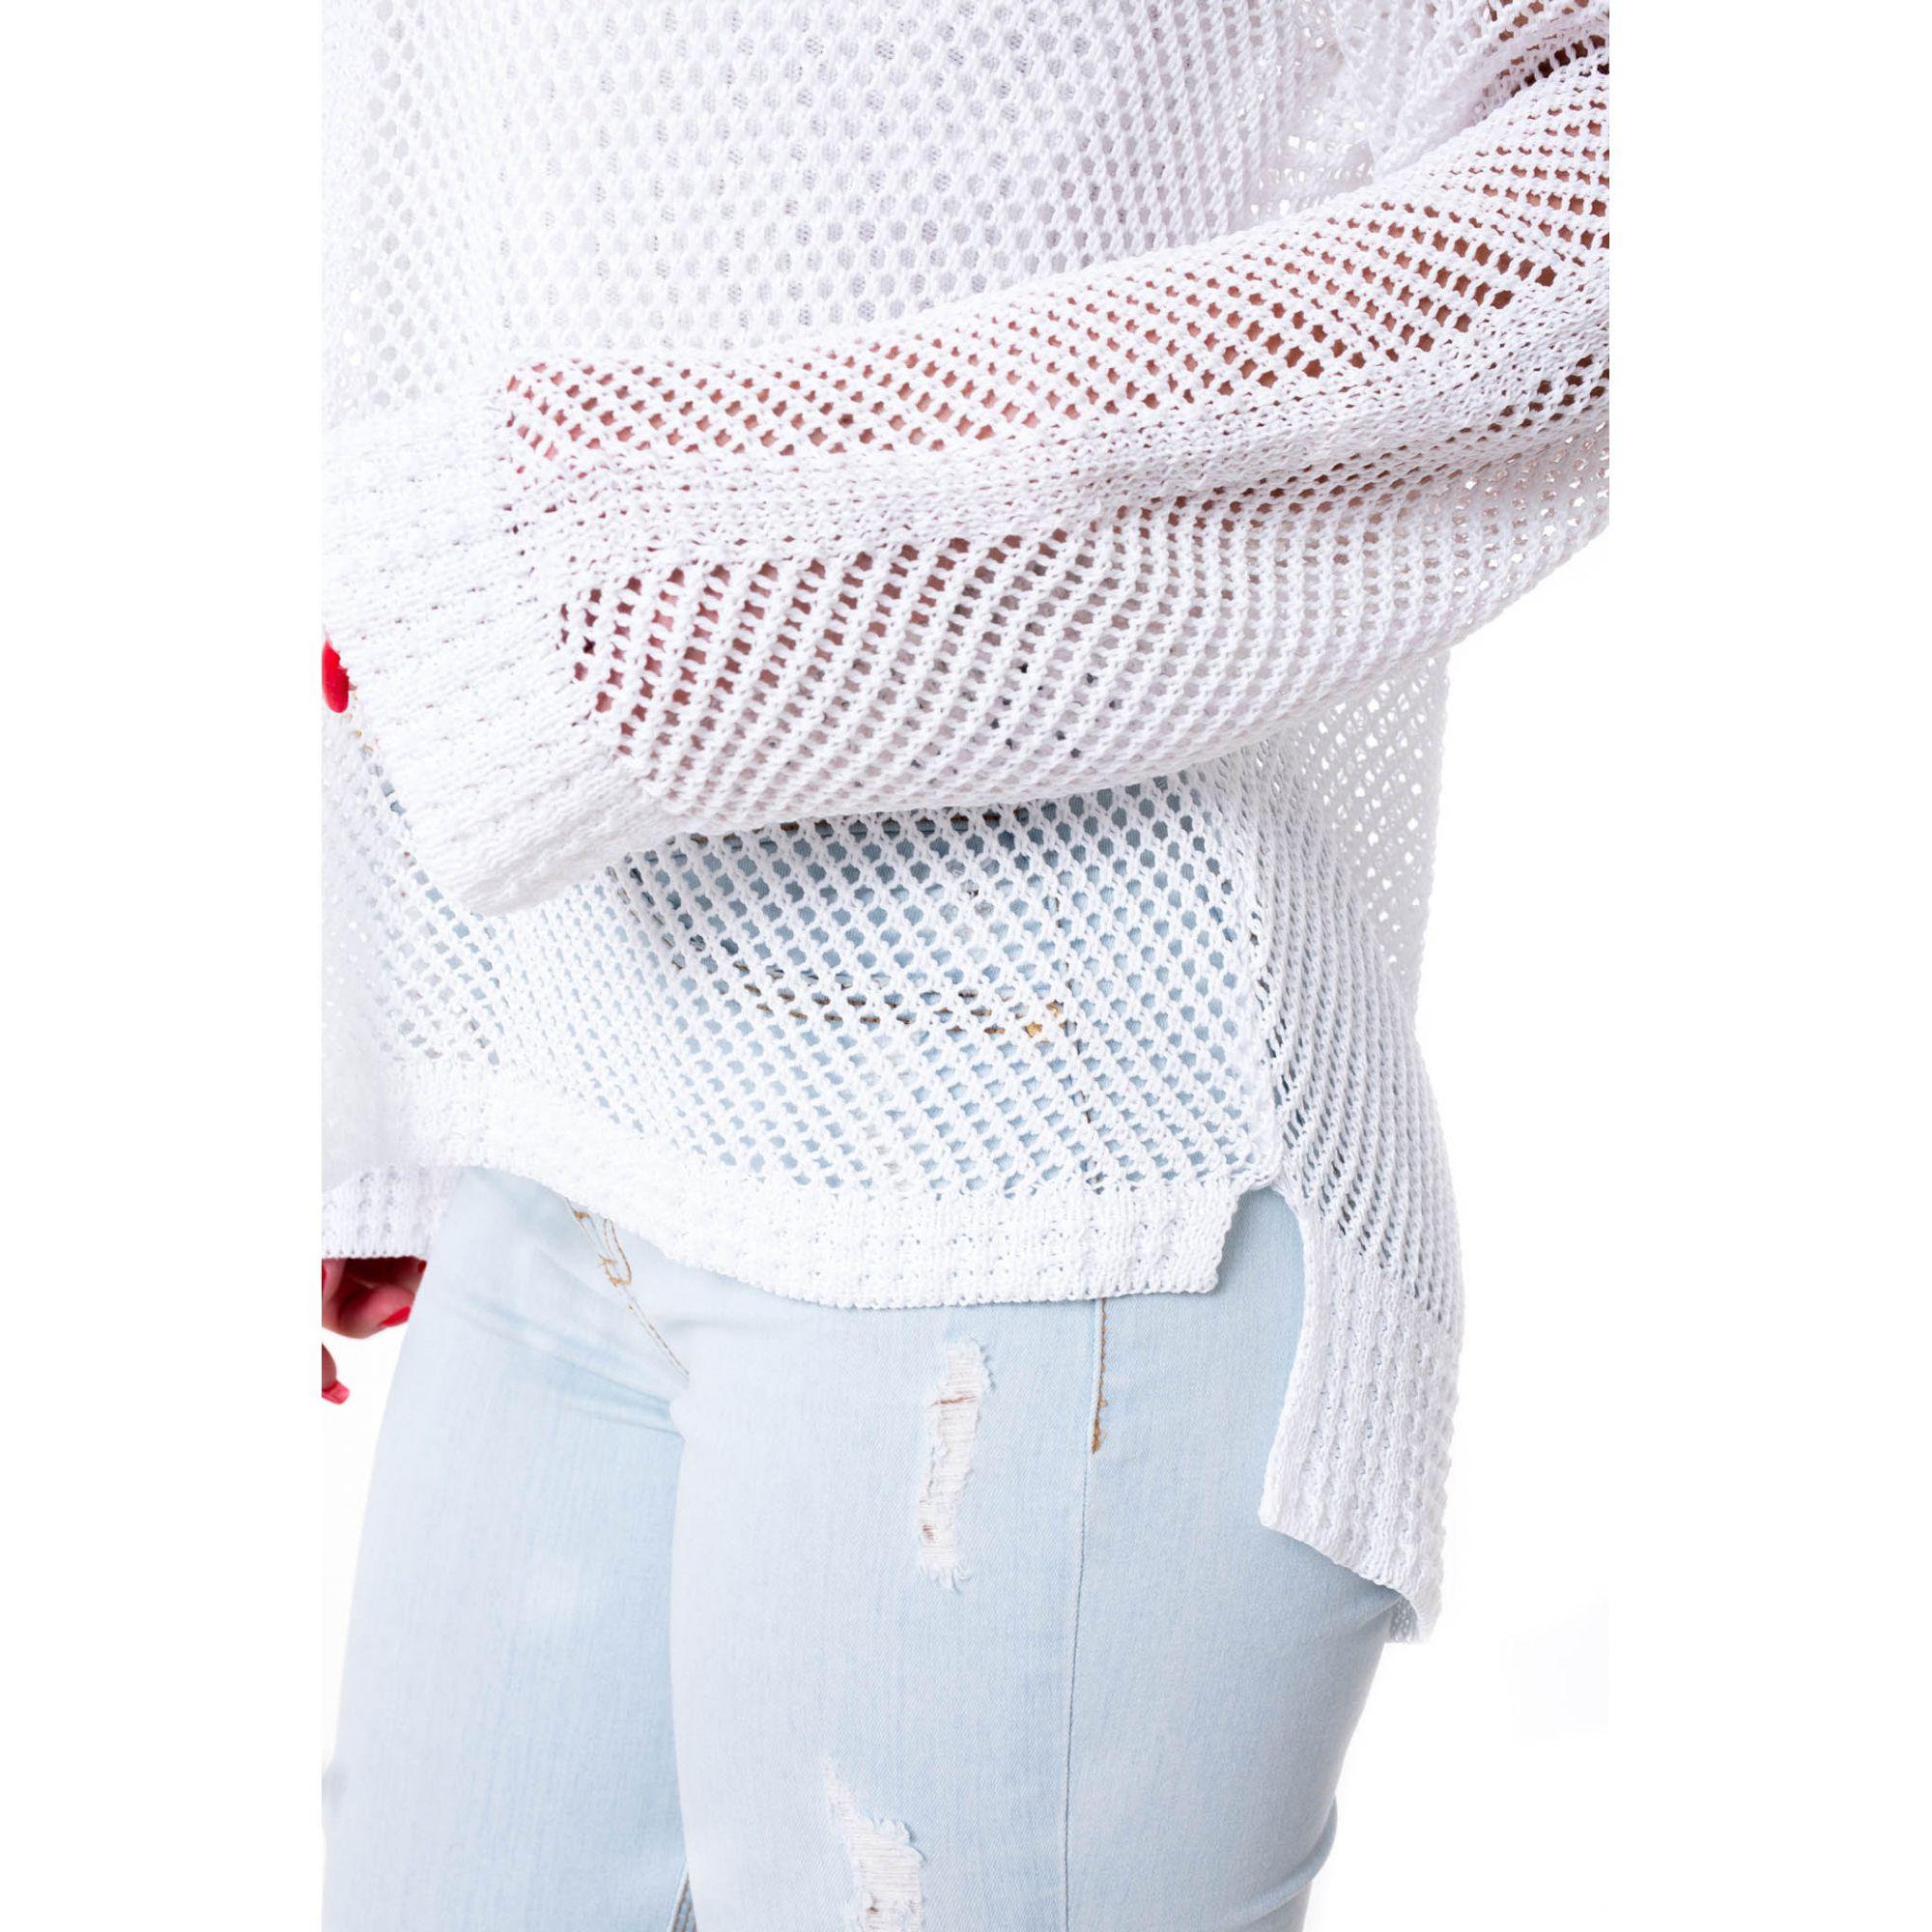 Blusa Mullet Vera Tricot Manga Longa Feminina Branca